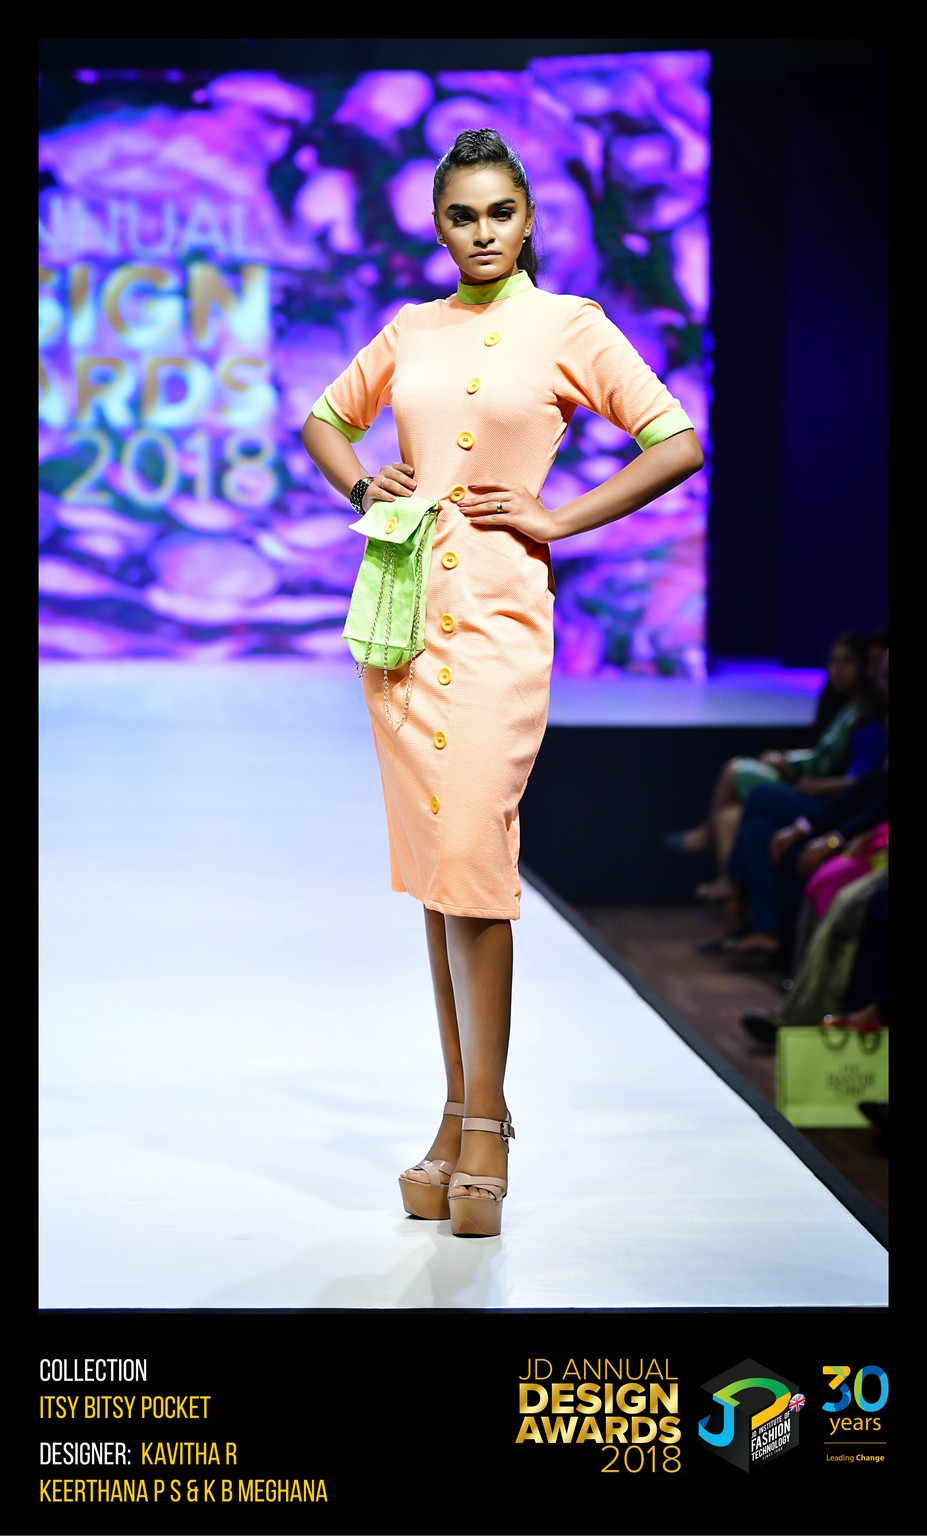 Itsy Bitsy Pocket Dress – Change – JD Annual Design Awards 2018   Designer: Kavitha, Keertana and Meghana   Photography : Jerin Nath (@jerin_nath) itsy bitsy pocket dress Itsy Bitsy Pocket Dress – Change – JD Annual Design Awards 2018 ITSY BITSY POCKET4